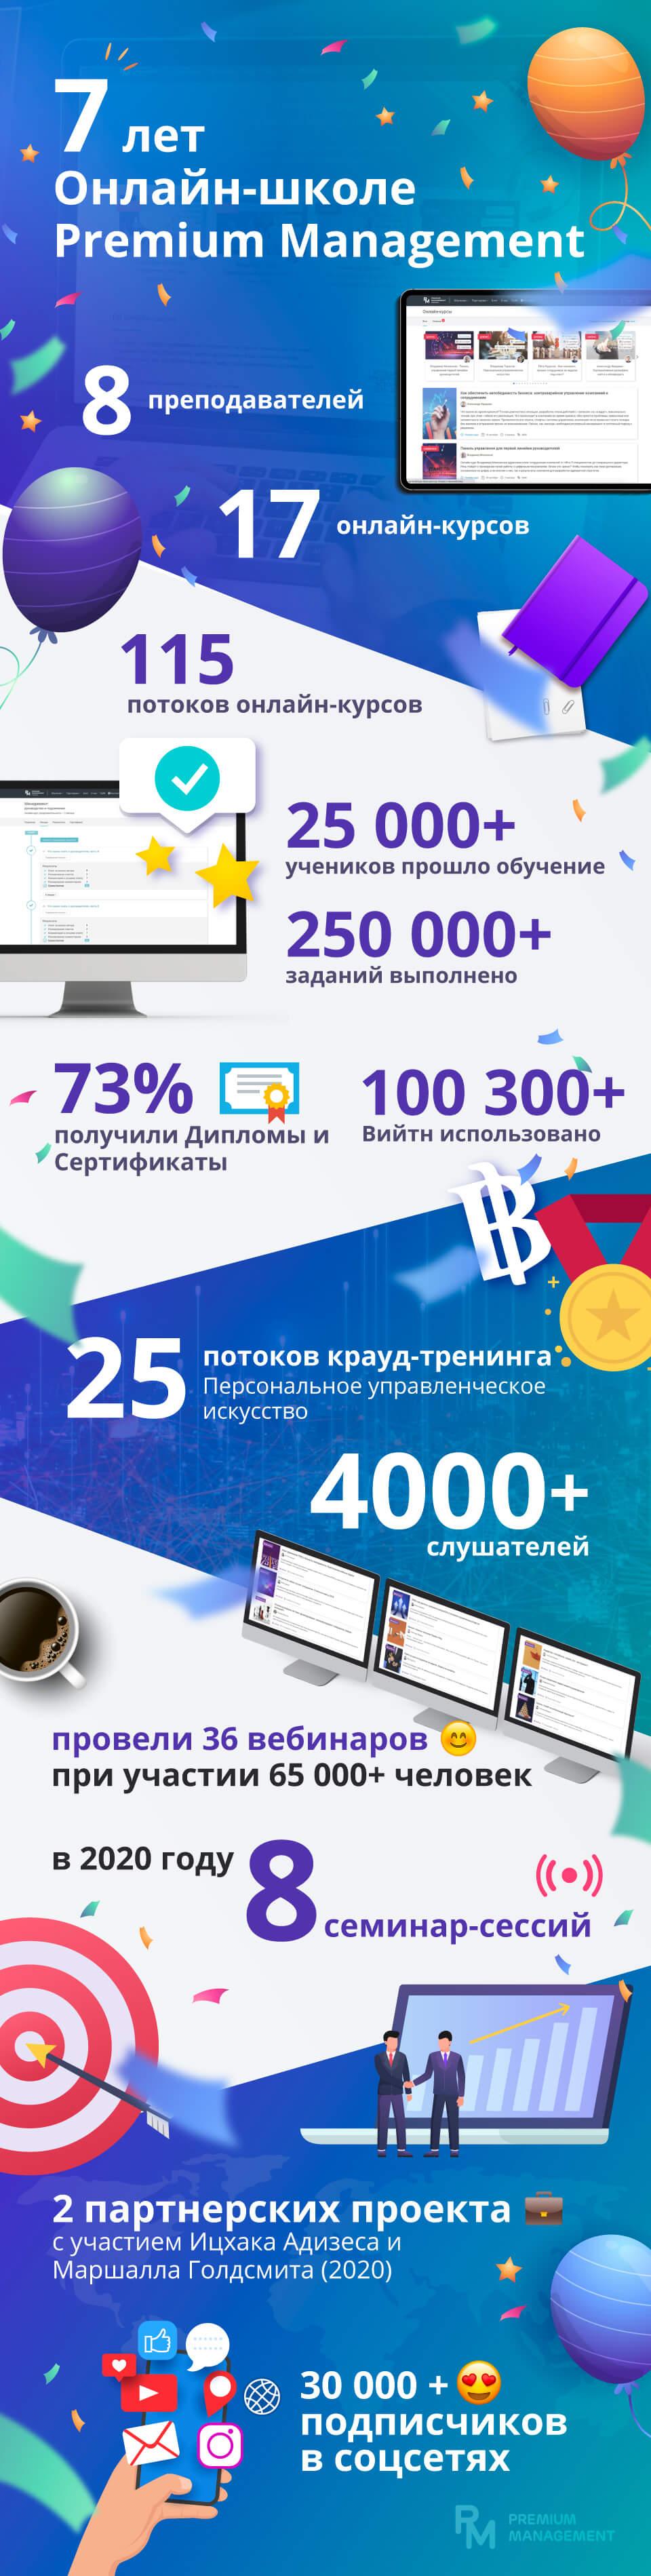 Premium Management, школа бизнеса, онлайн-образование